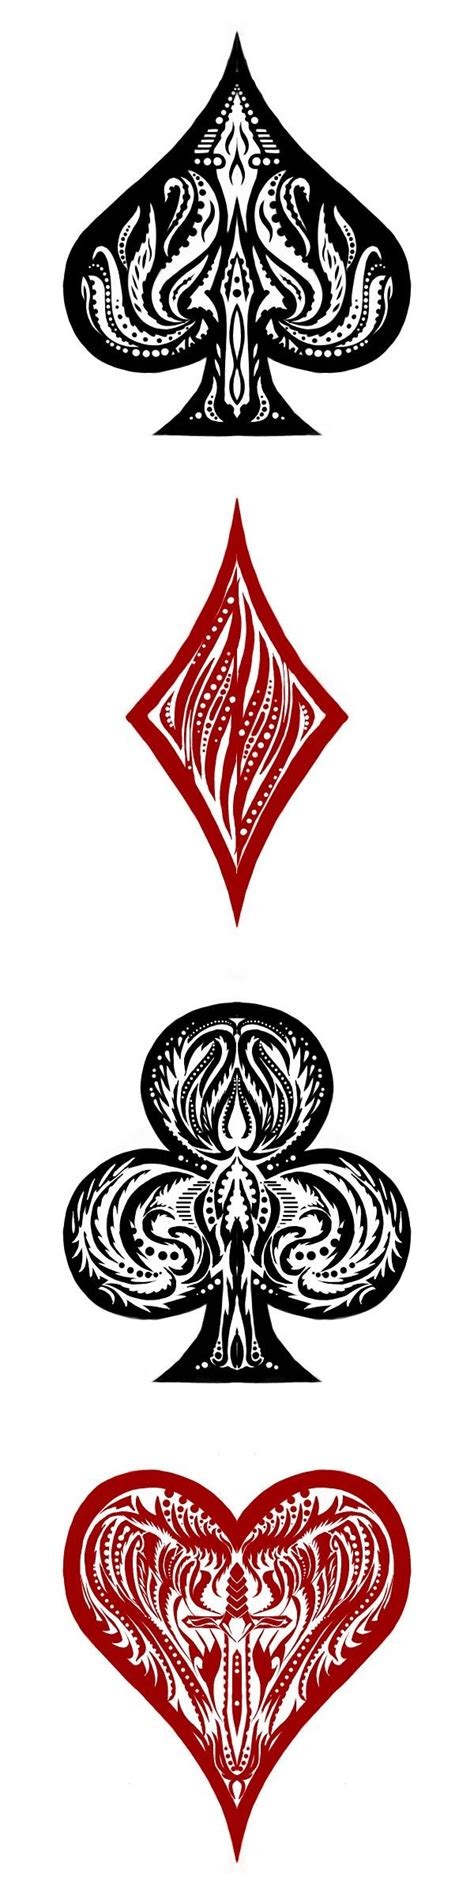 card tattoo designs design fill card suits souts tattoos designs